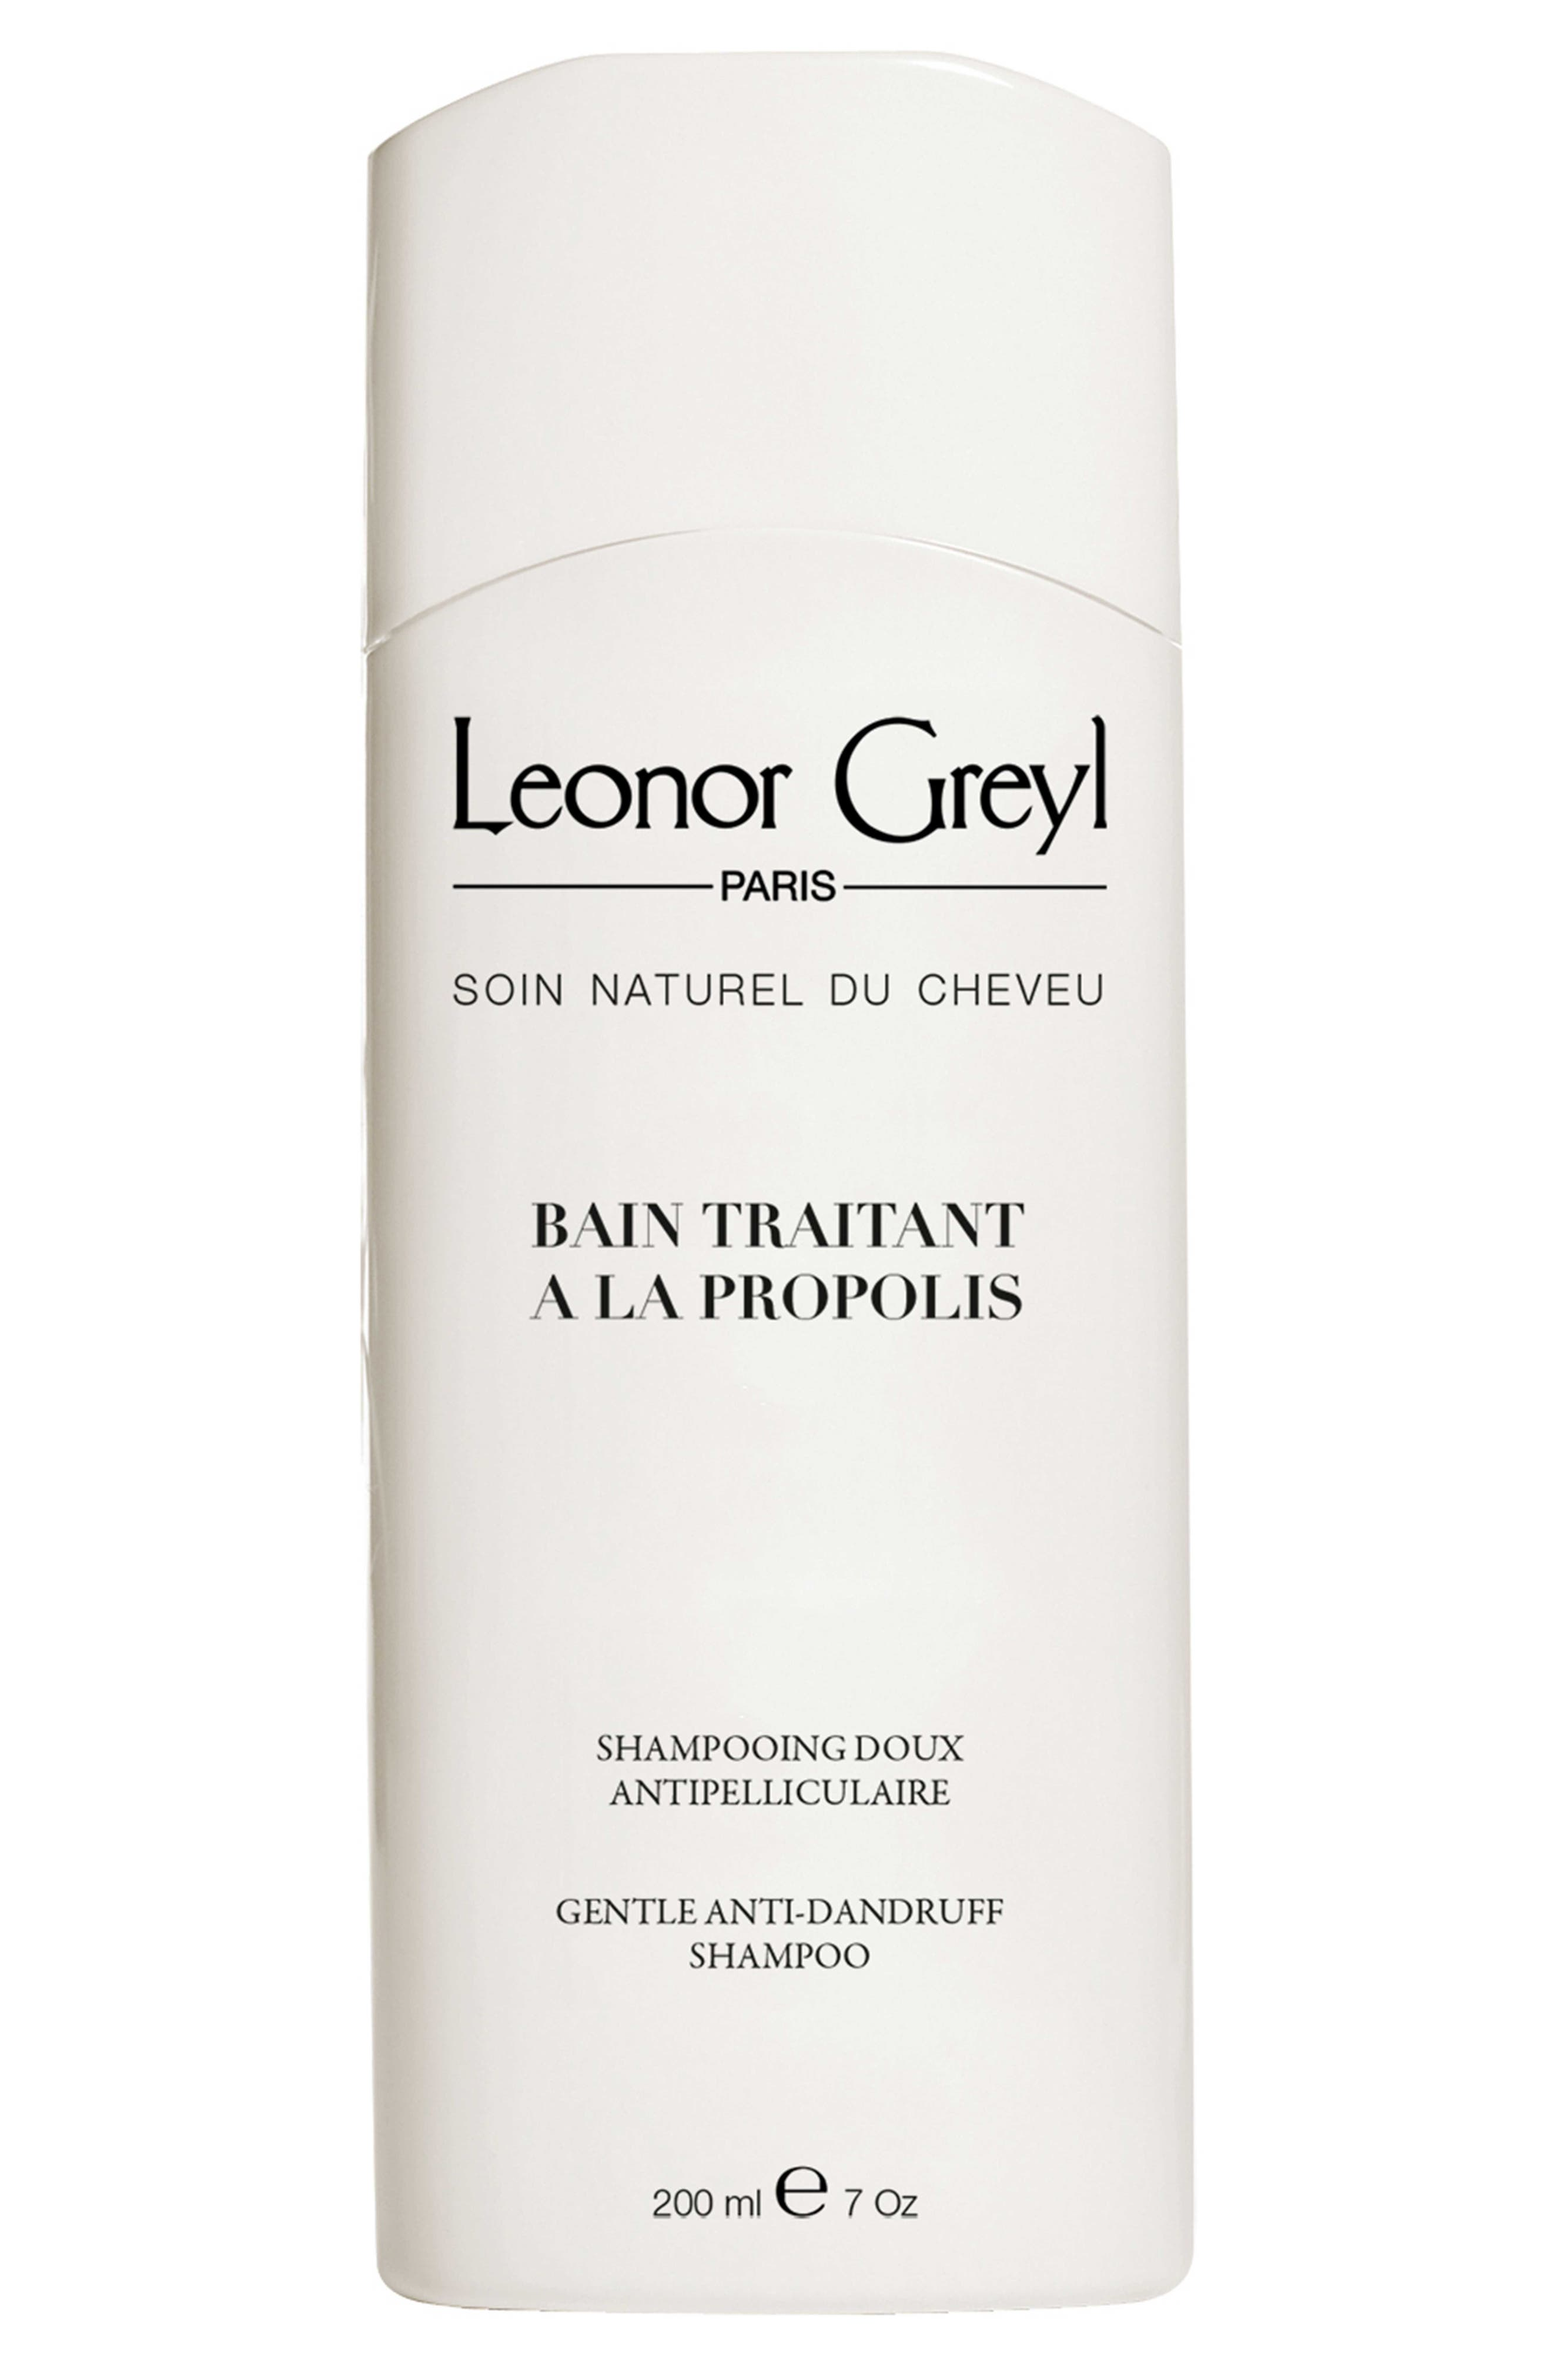 LEONOR GREYL Bain Traitant A La Propolis (Gentle Anti-Dandruff Shampoo), 7.0 Oz./ 200 Ml